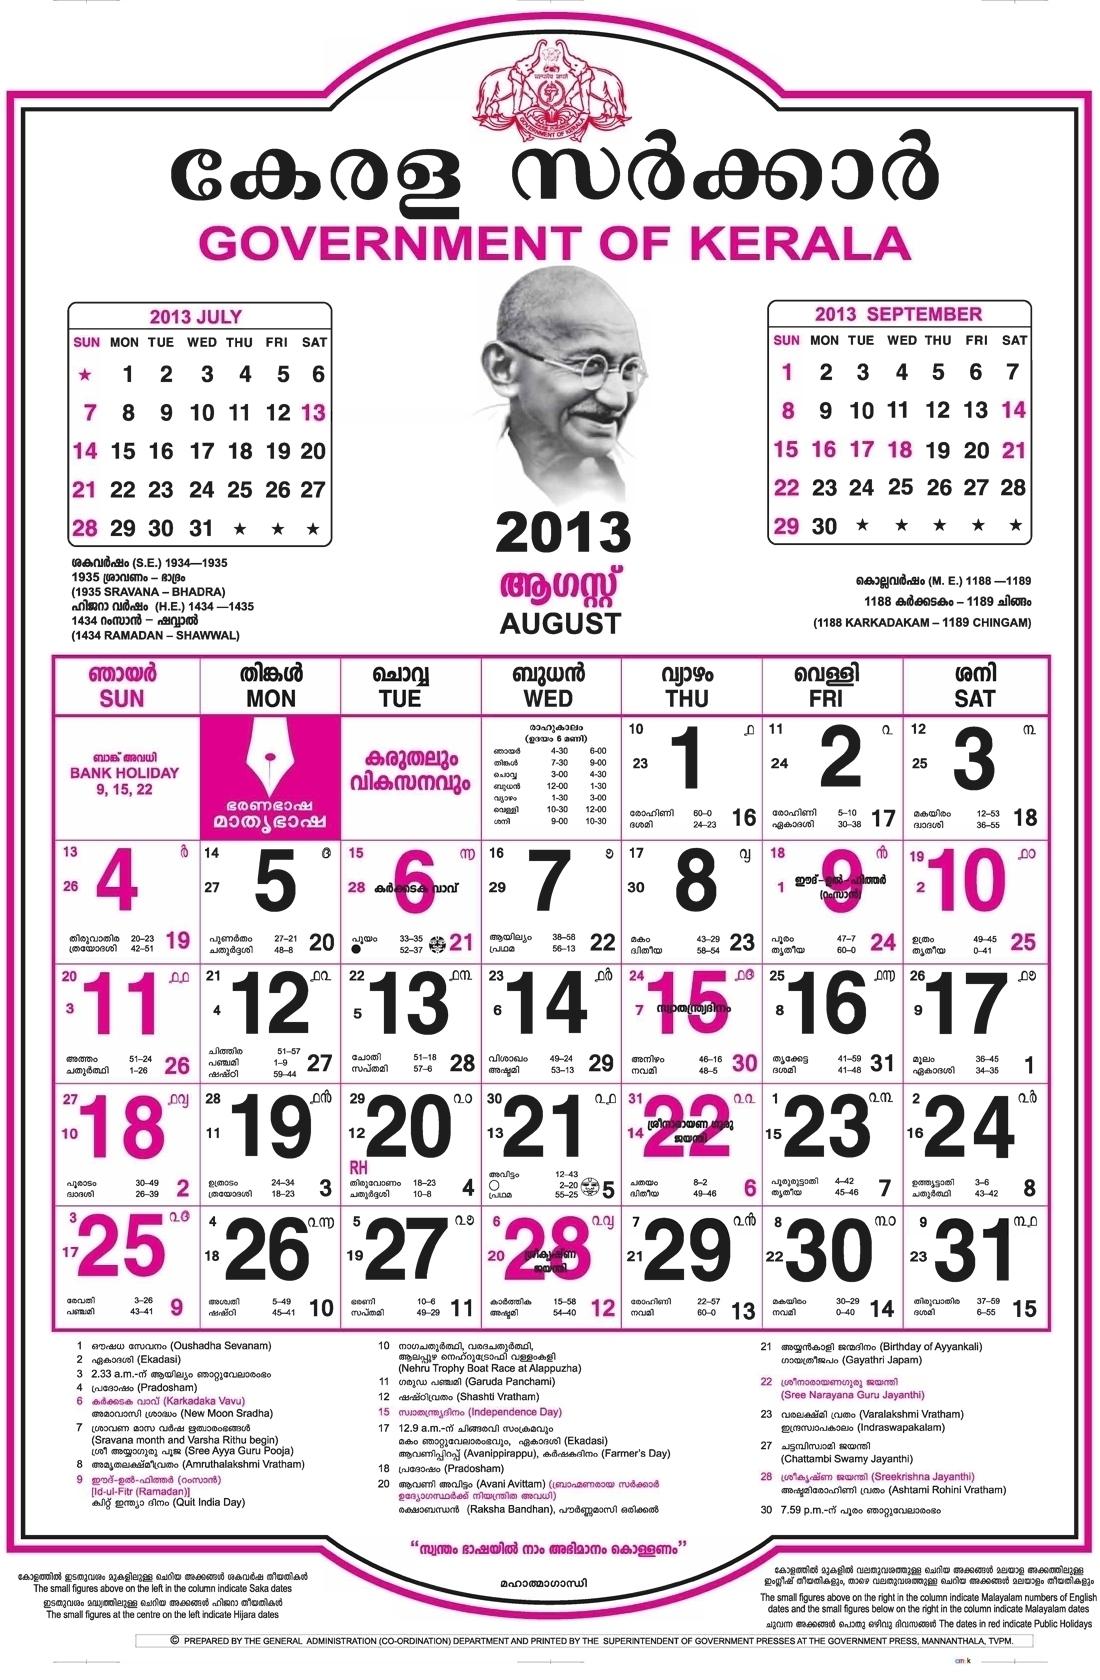 Calendar 2001 Malayalam August Image | Template Calendar Printable in Calendar 2001 Malayalam August Image